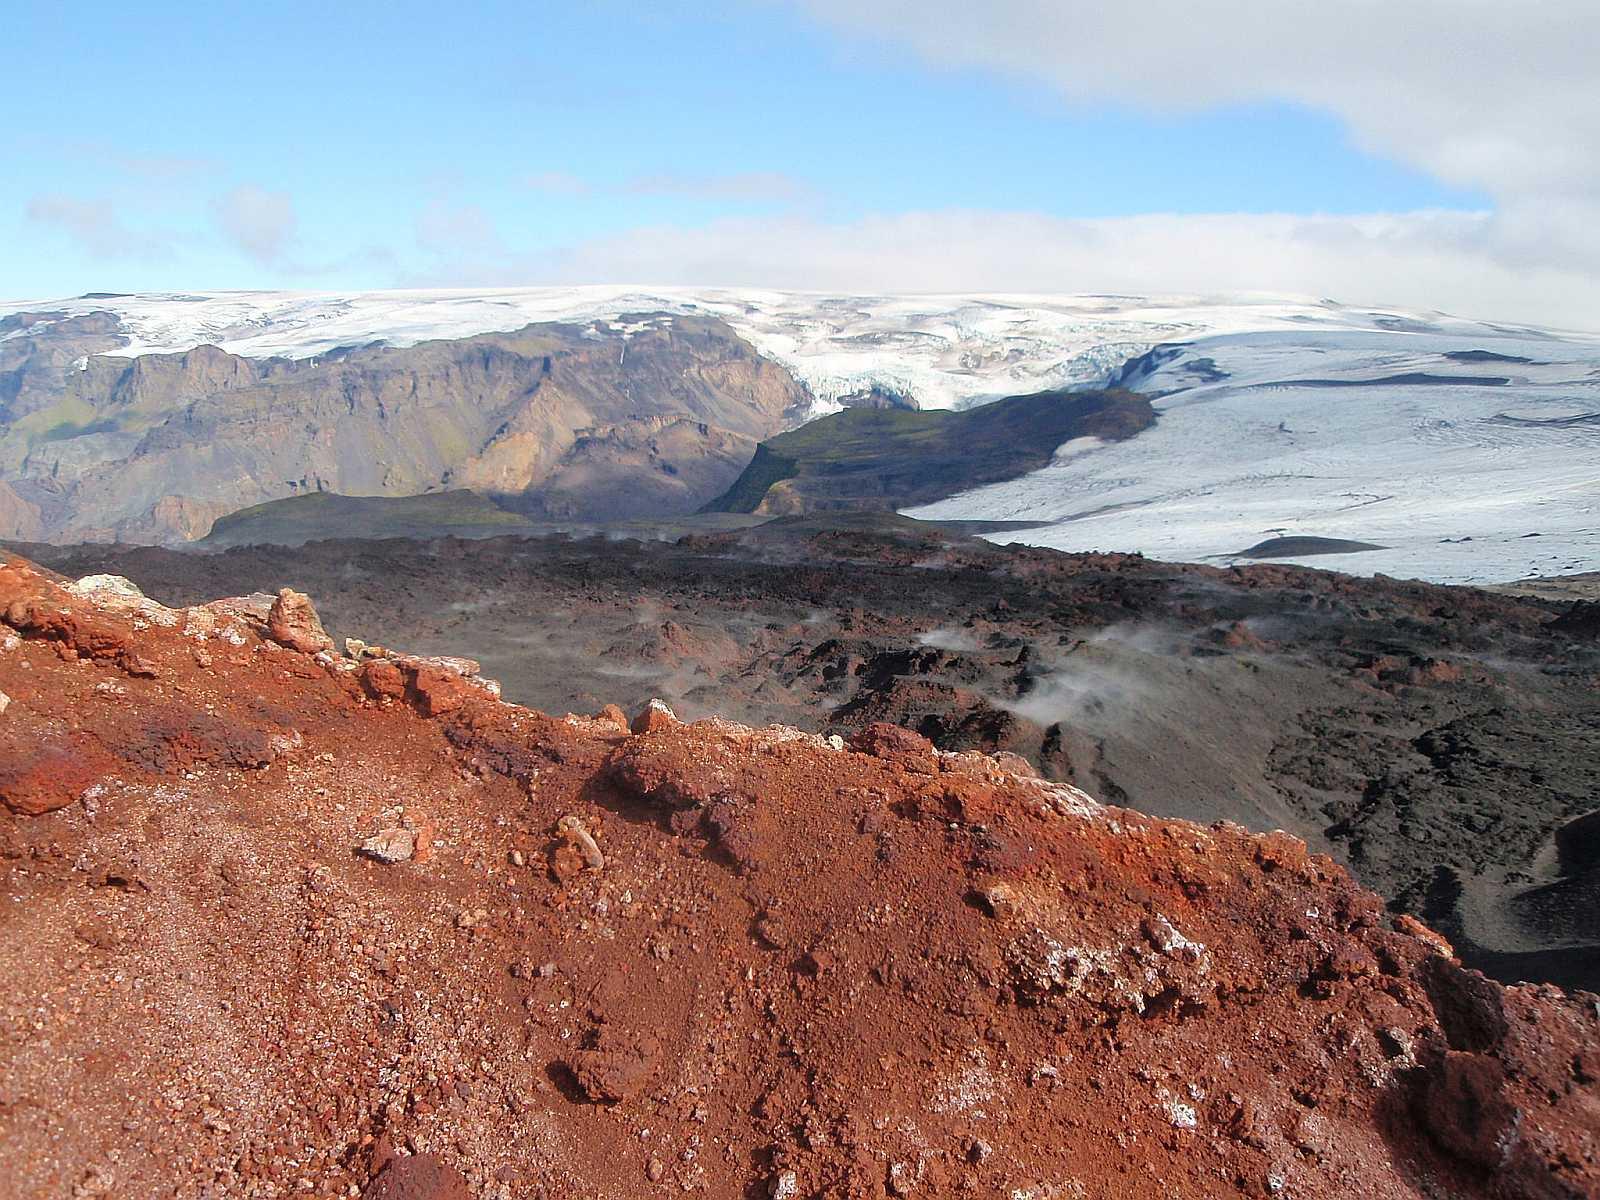 Volcanic rock and Mýrdalsjökull glacier